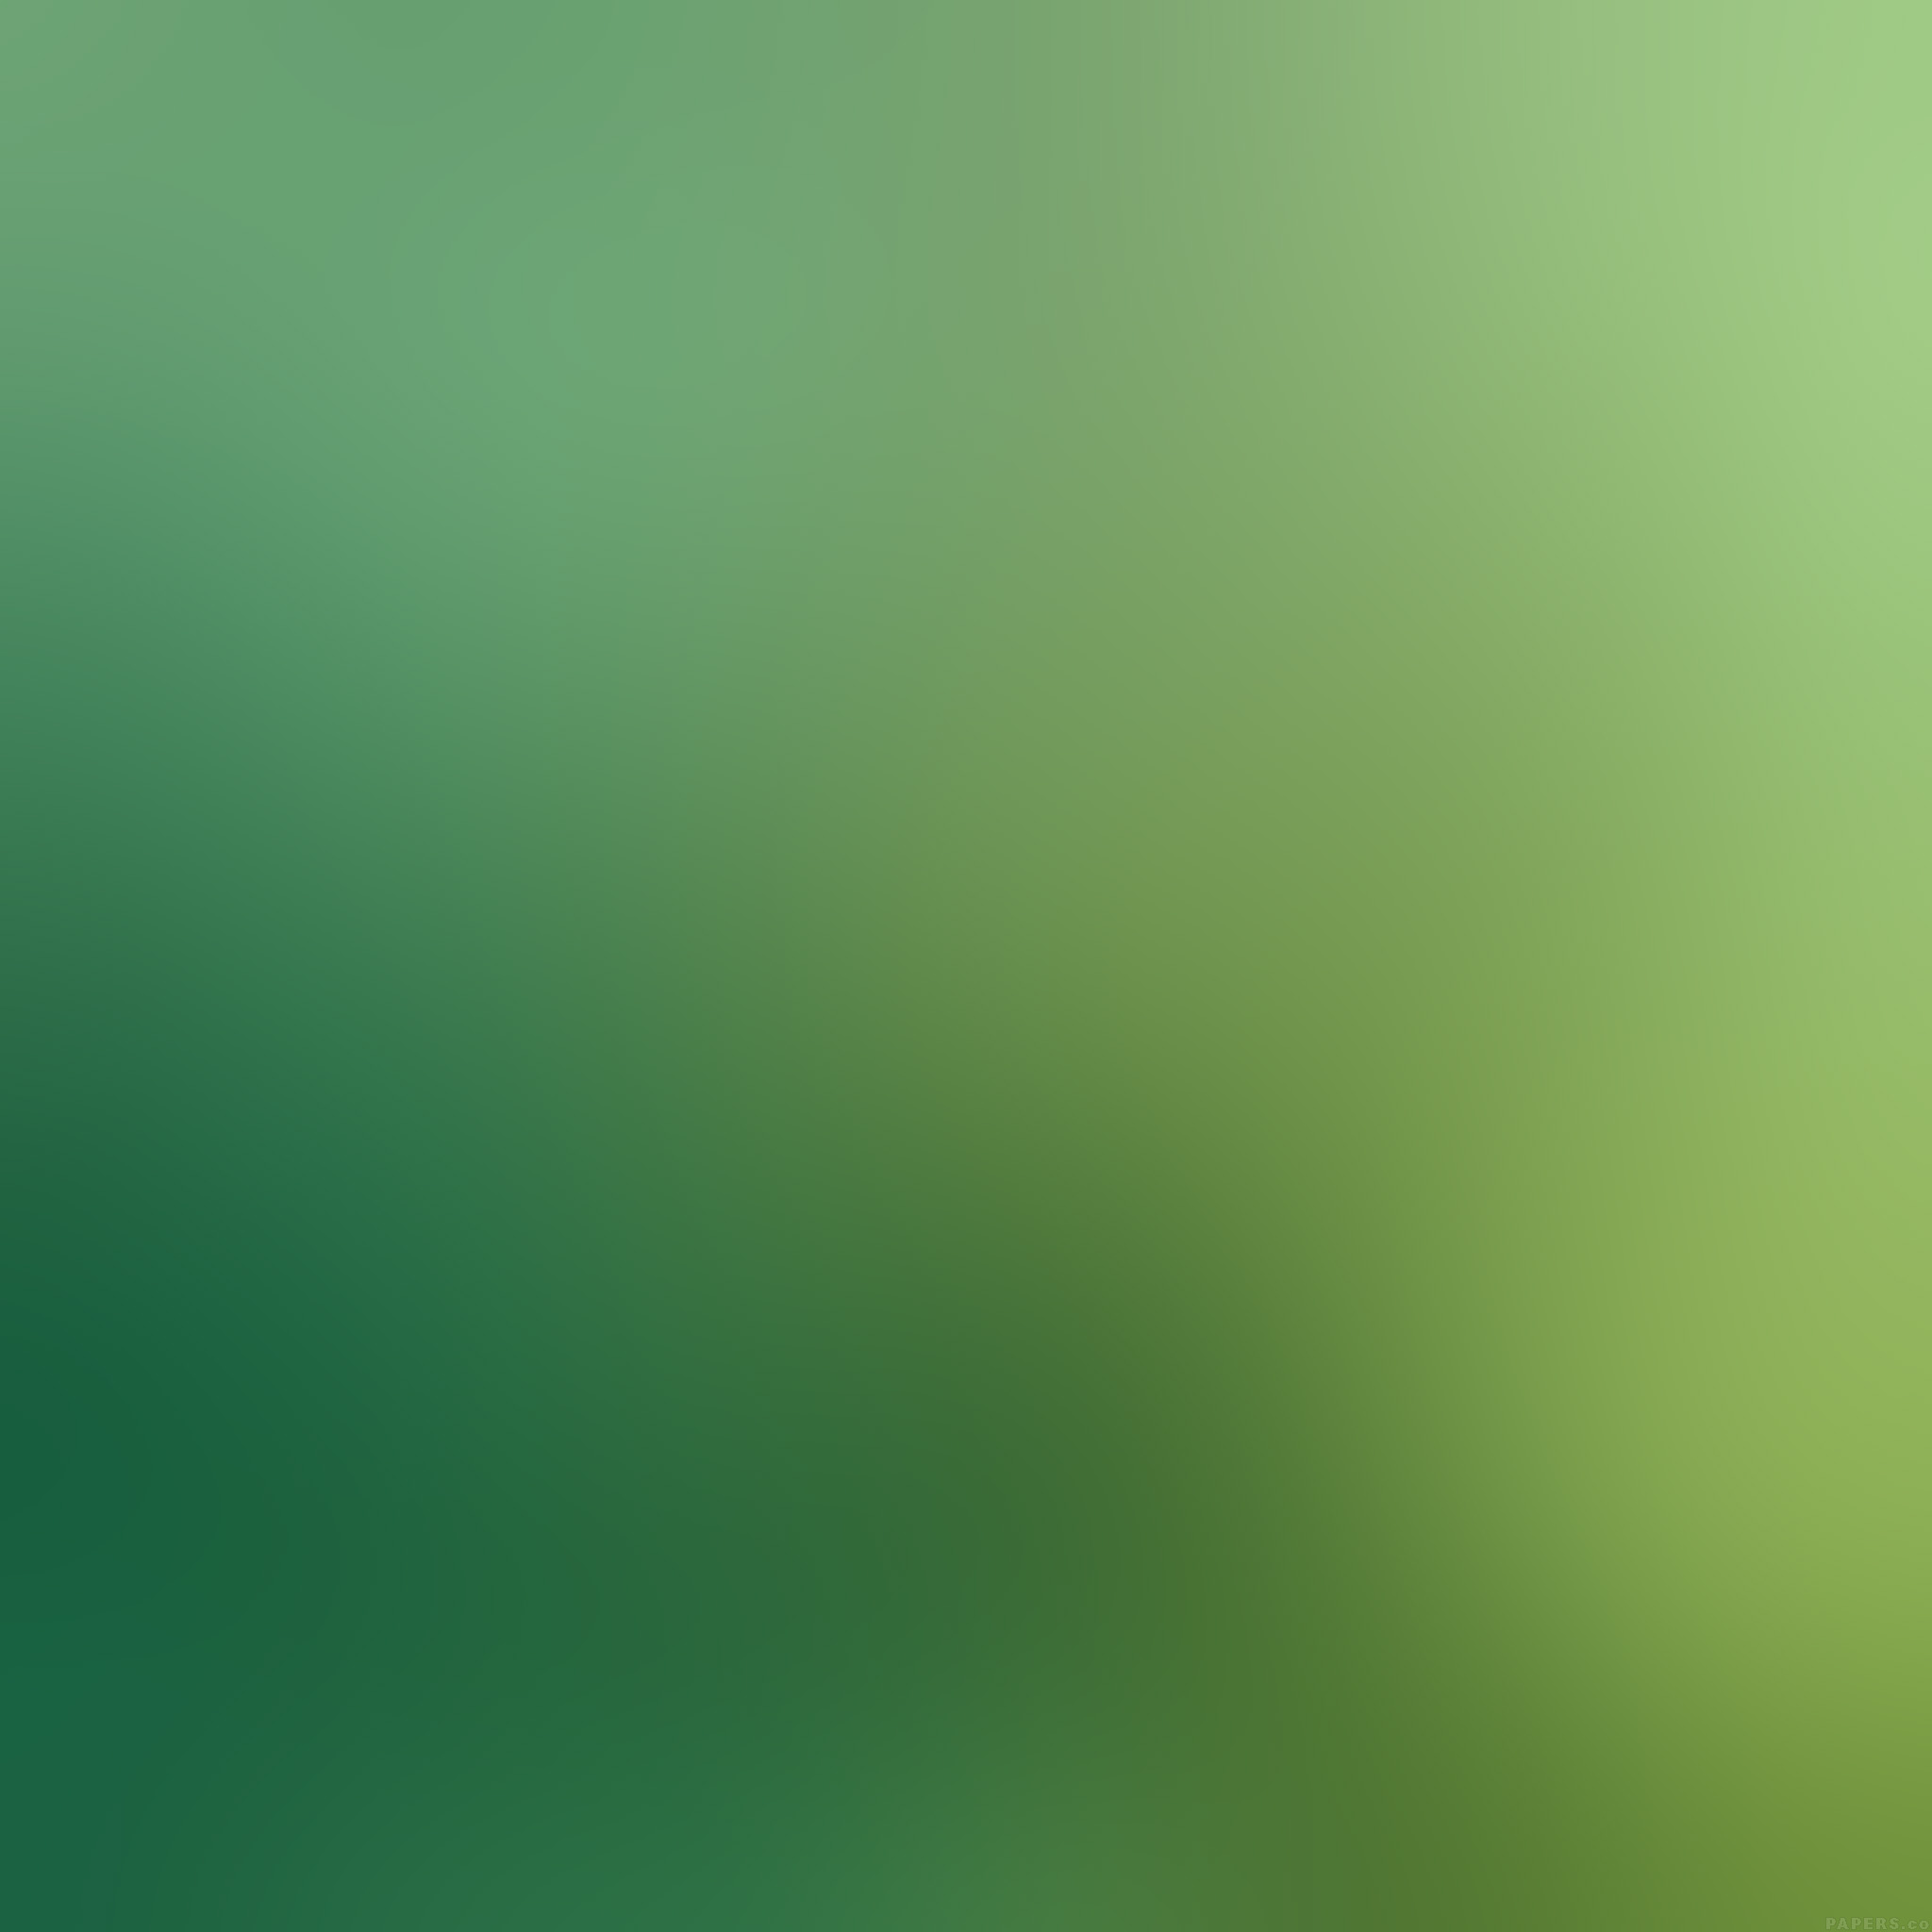 Wallpaper Iphone Peace And Love : FREEIOS7 sd67-green-peace-love-nature-gradation-blur - parallax HD iPhone iPad wallpaper